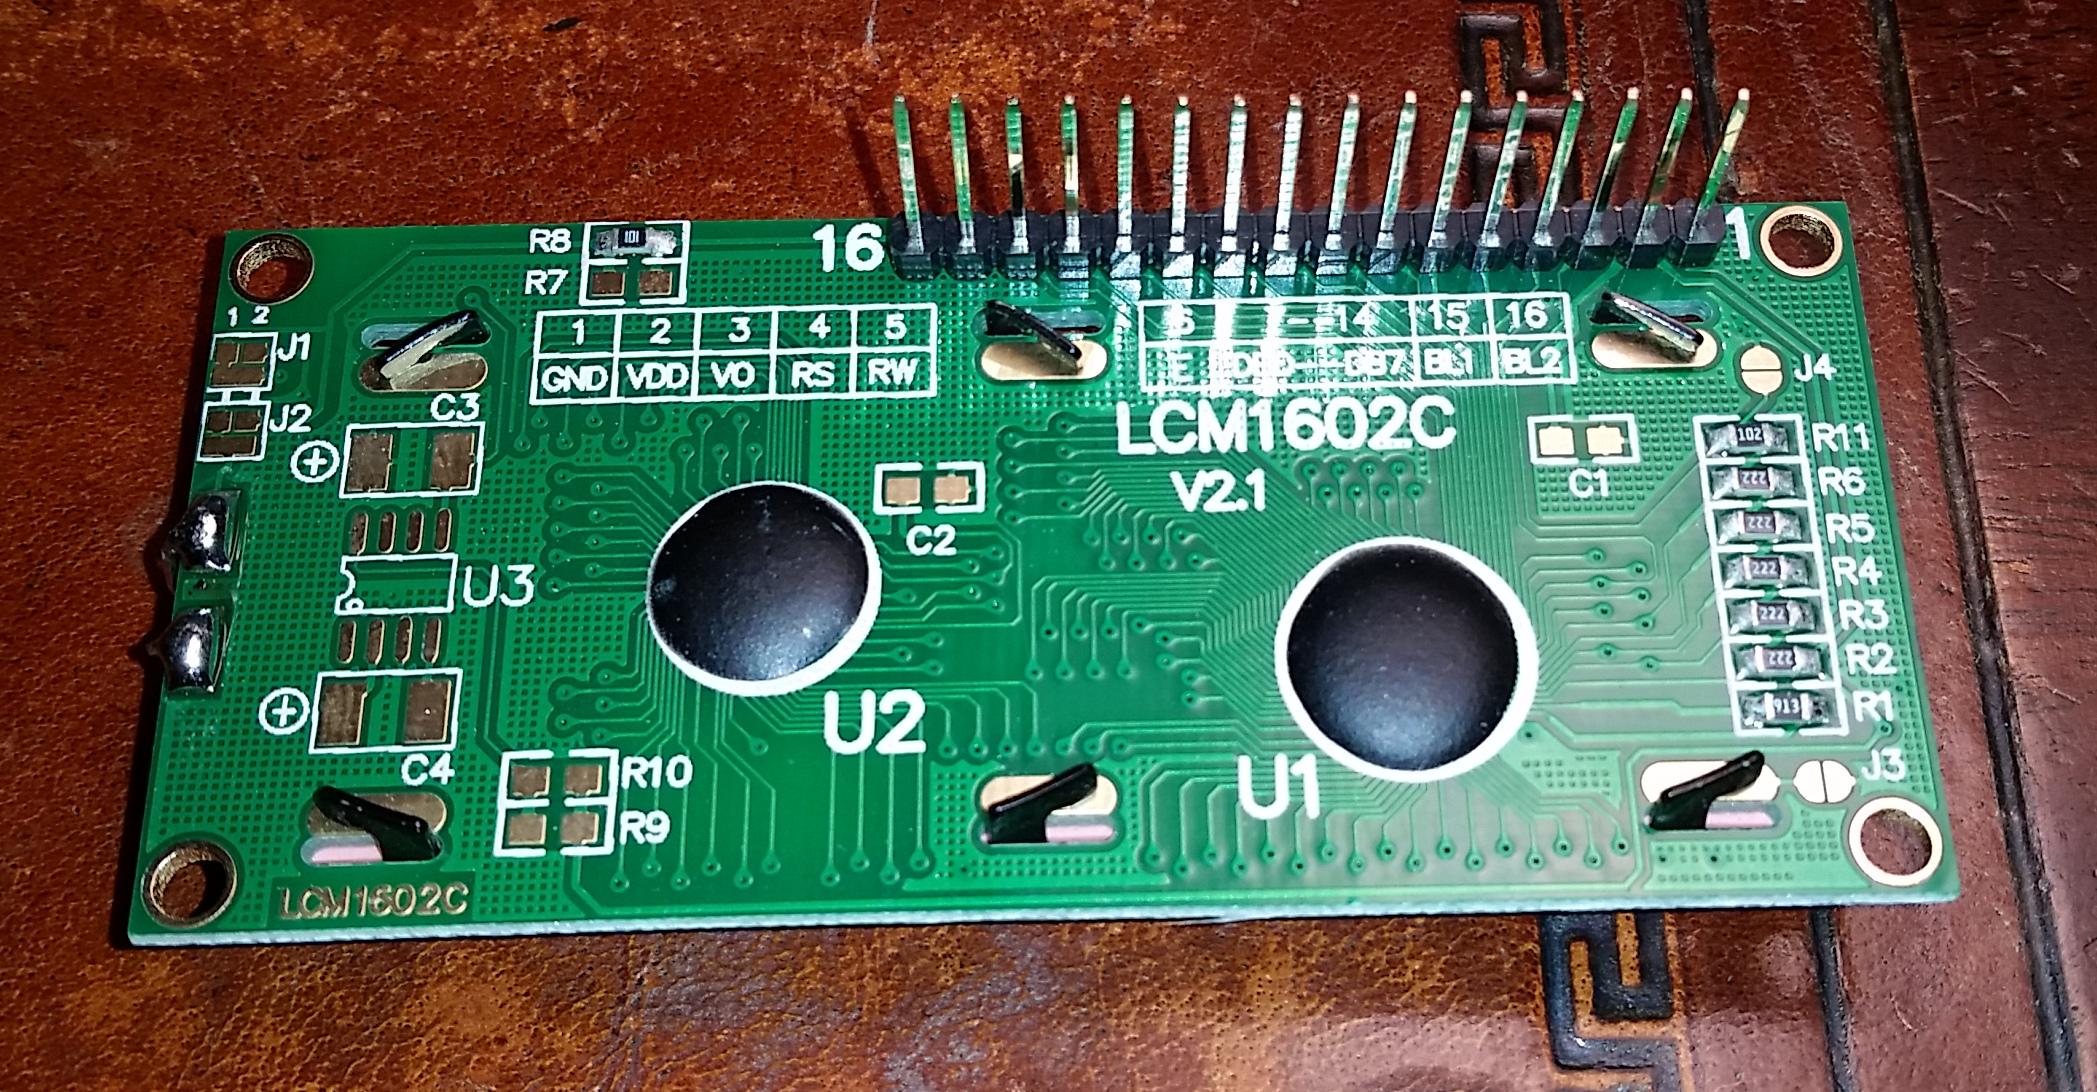 LCM1602C_underside site 2241 a random geek page LCD -Display Wiring at honlapkeszites.co